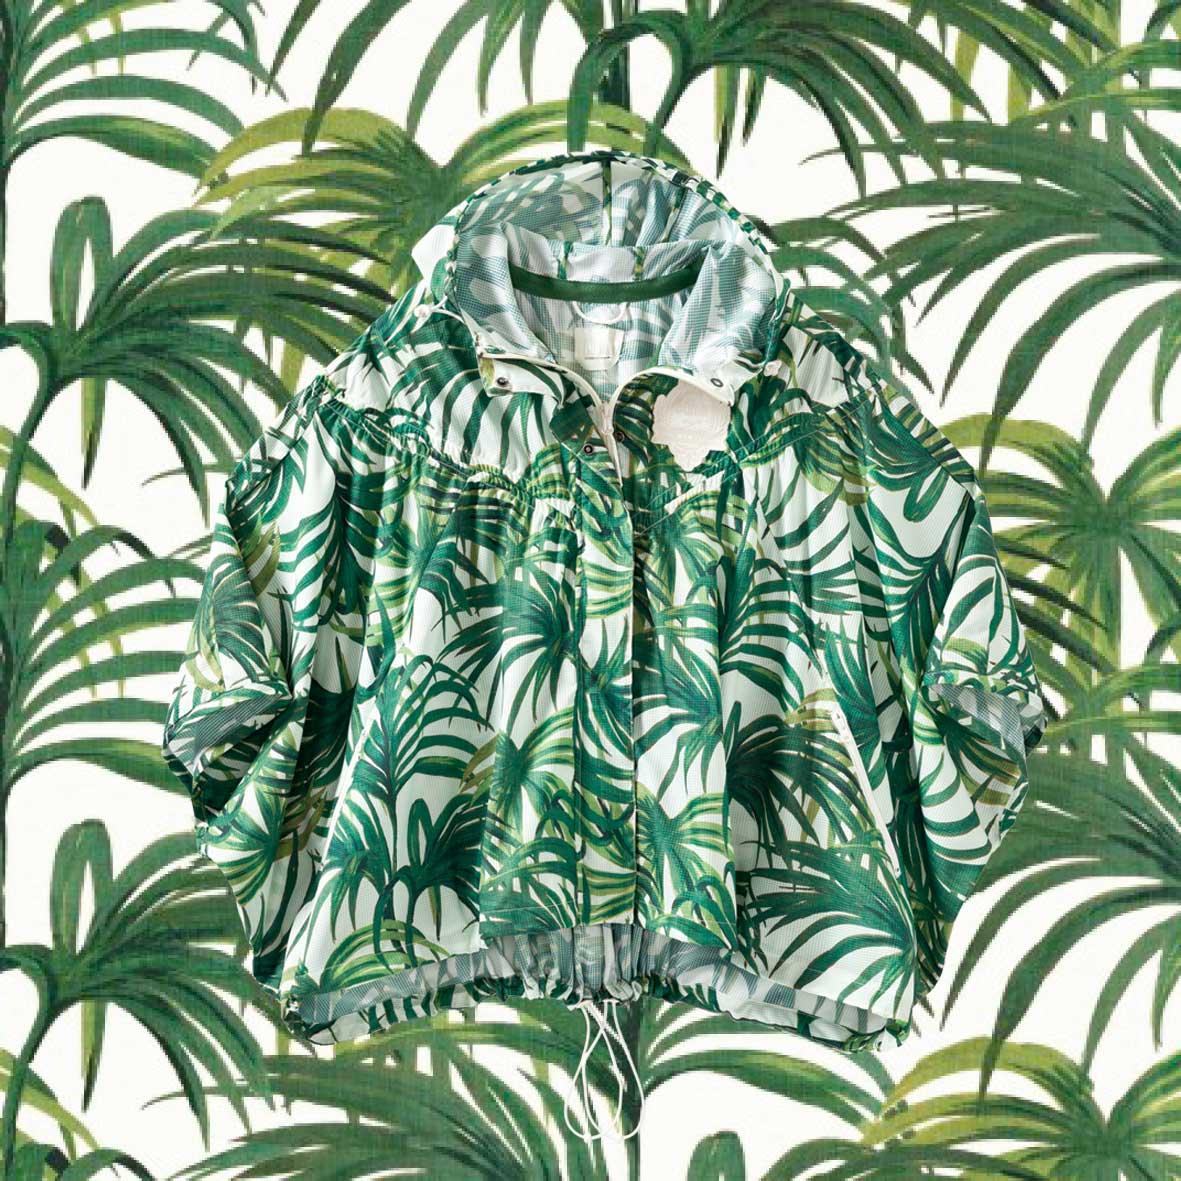 puma-x-hoh-jacket-image-1